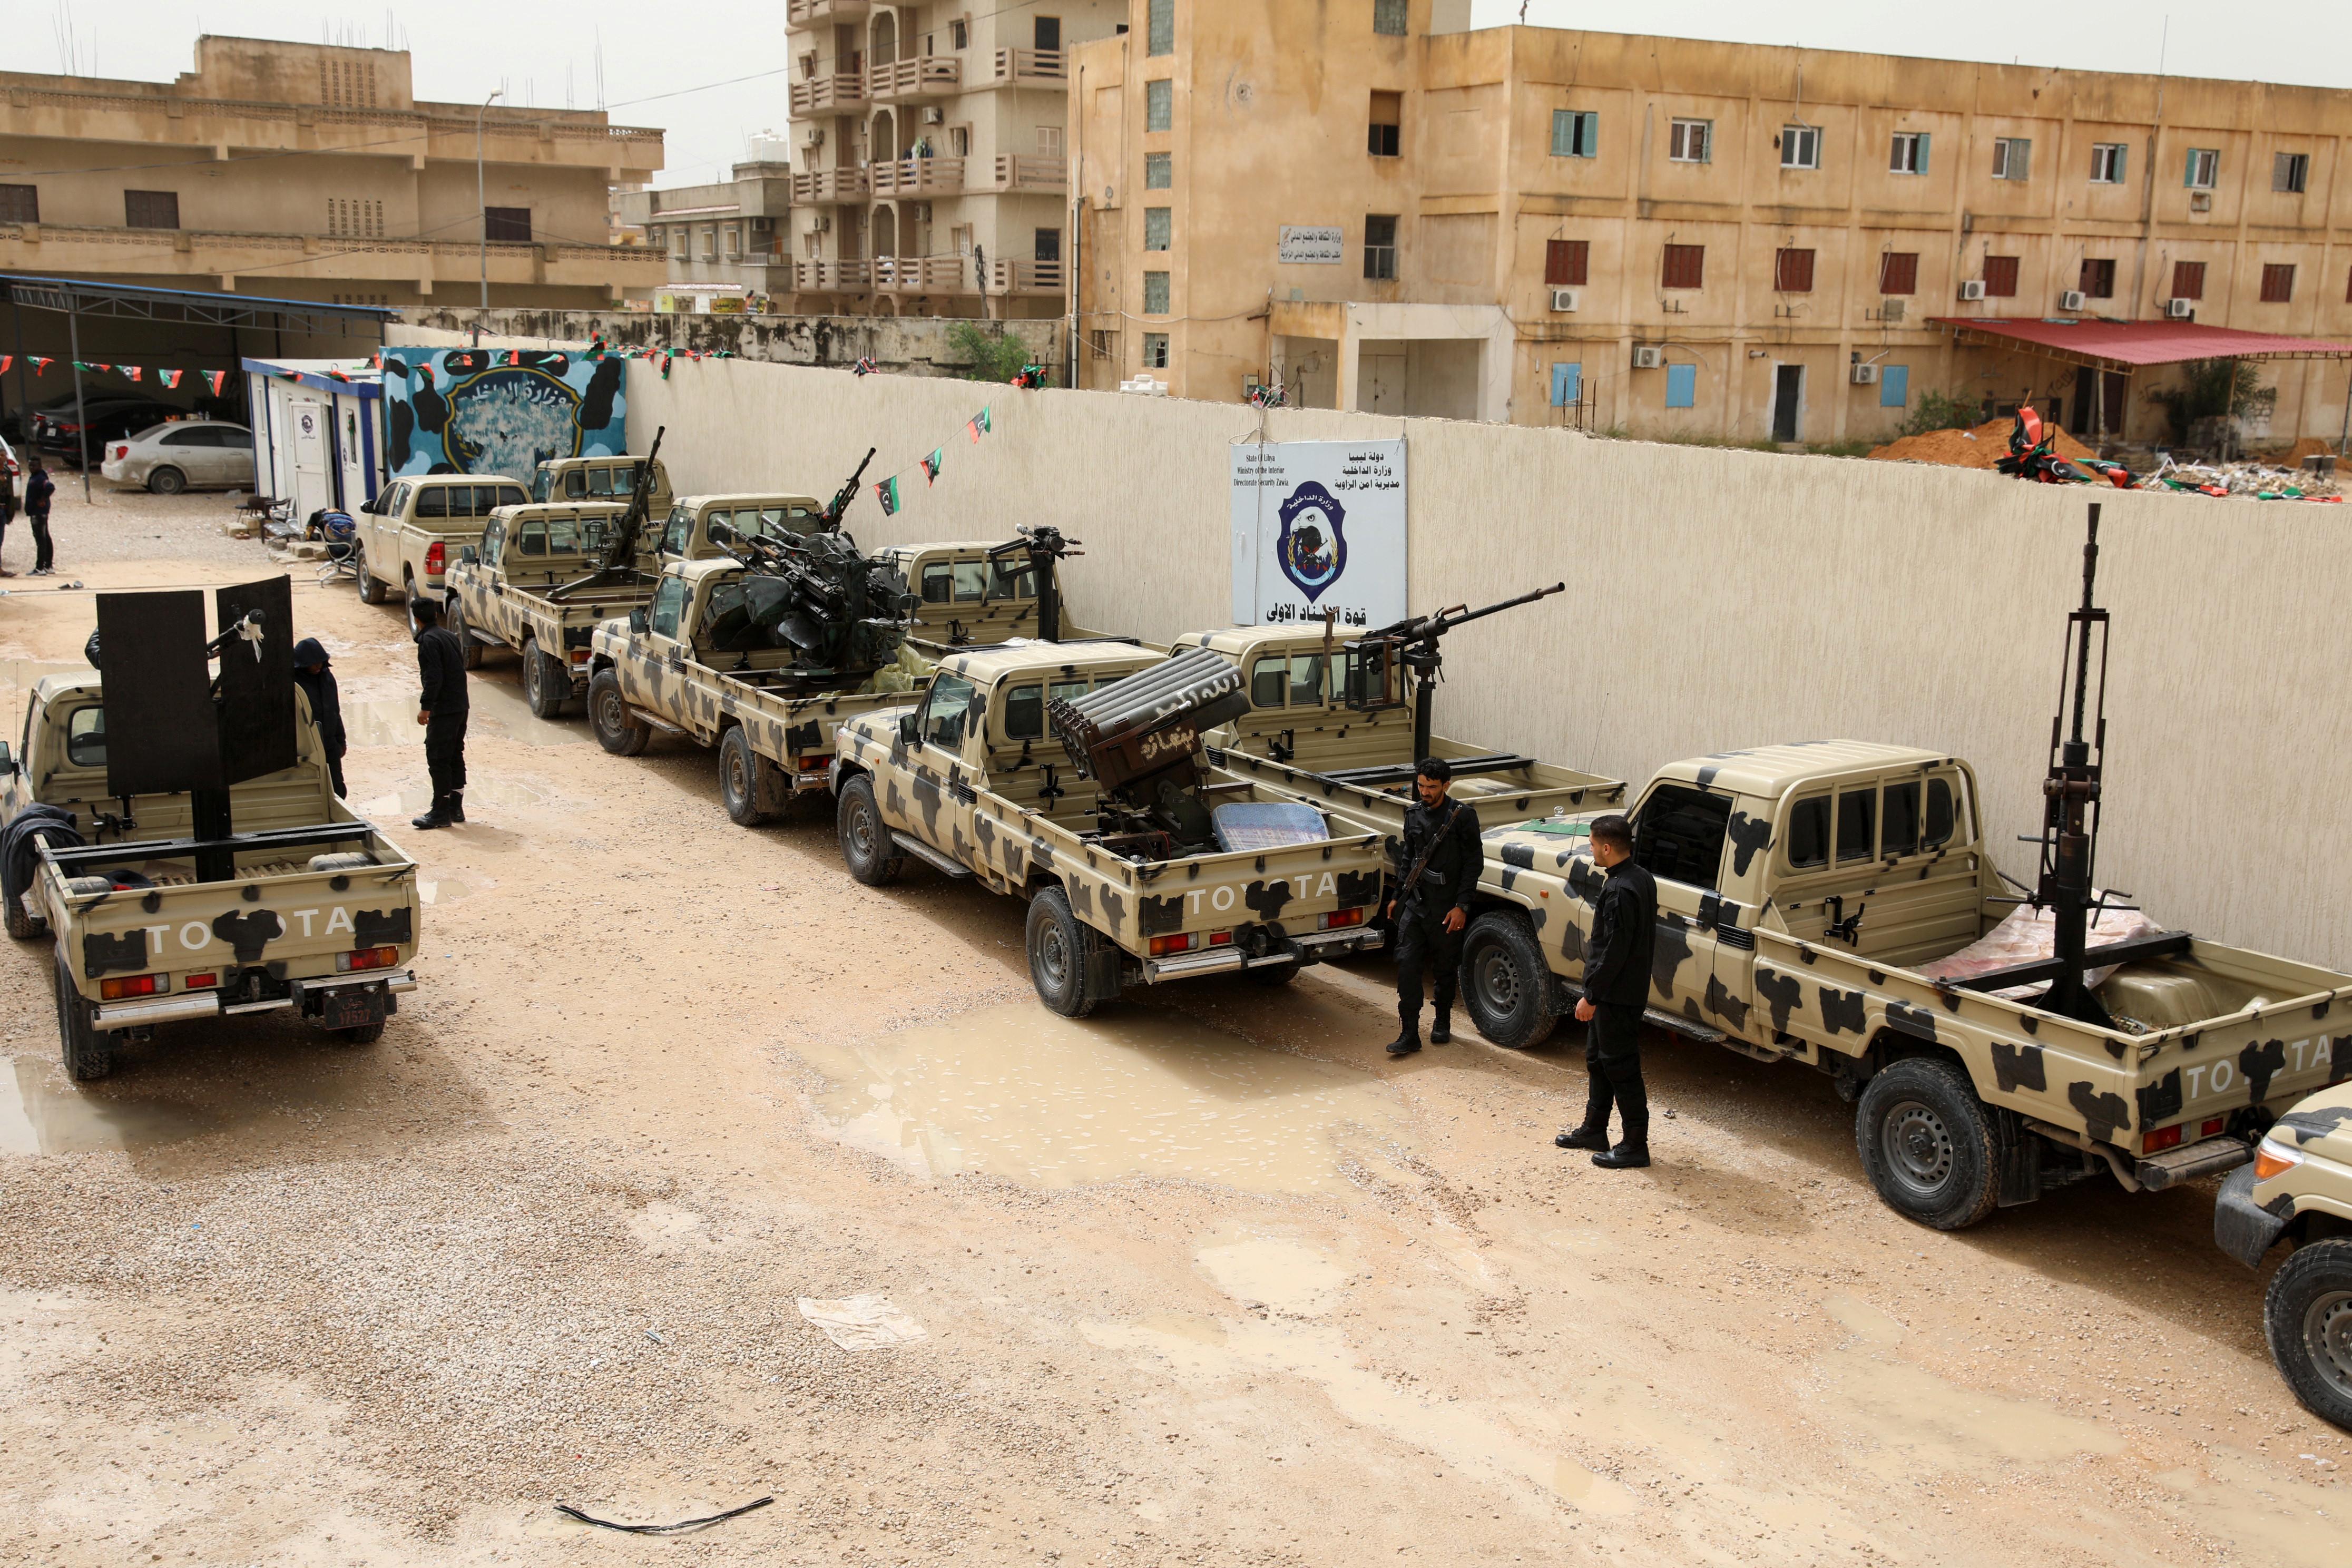 Forças do marechal Khalifa Haftar sofrem raide aéreo a sul de Tripoli